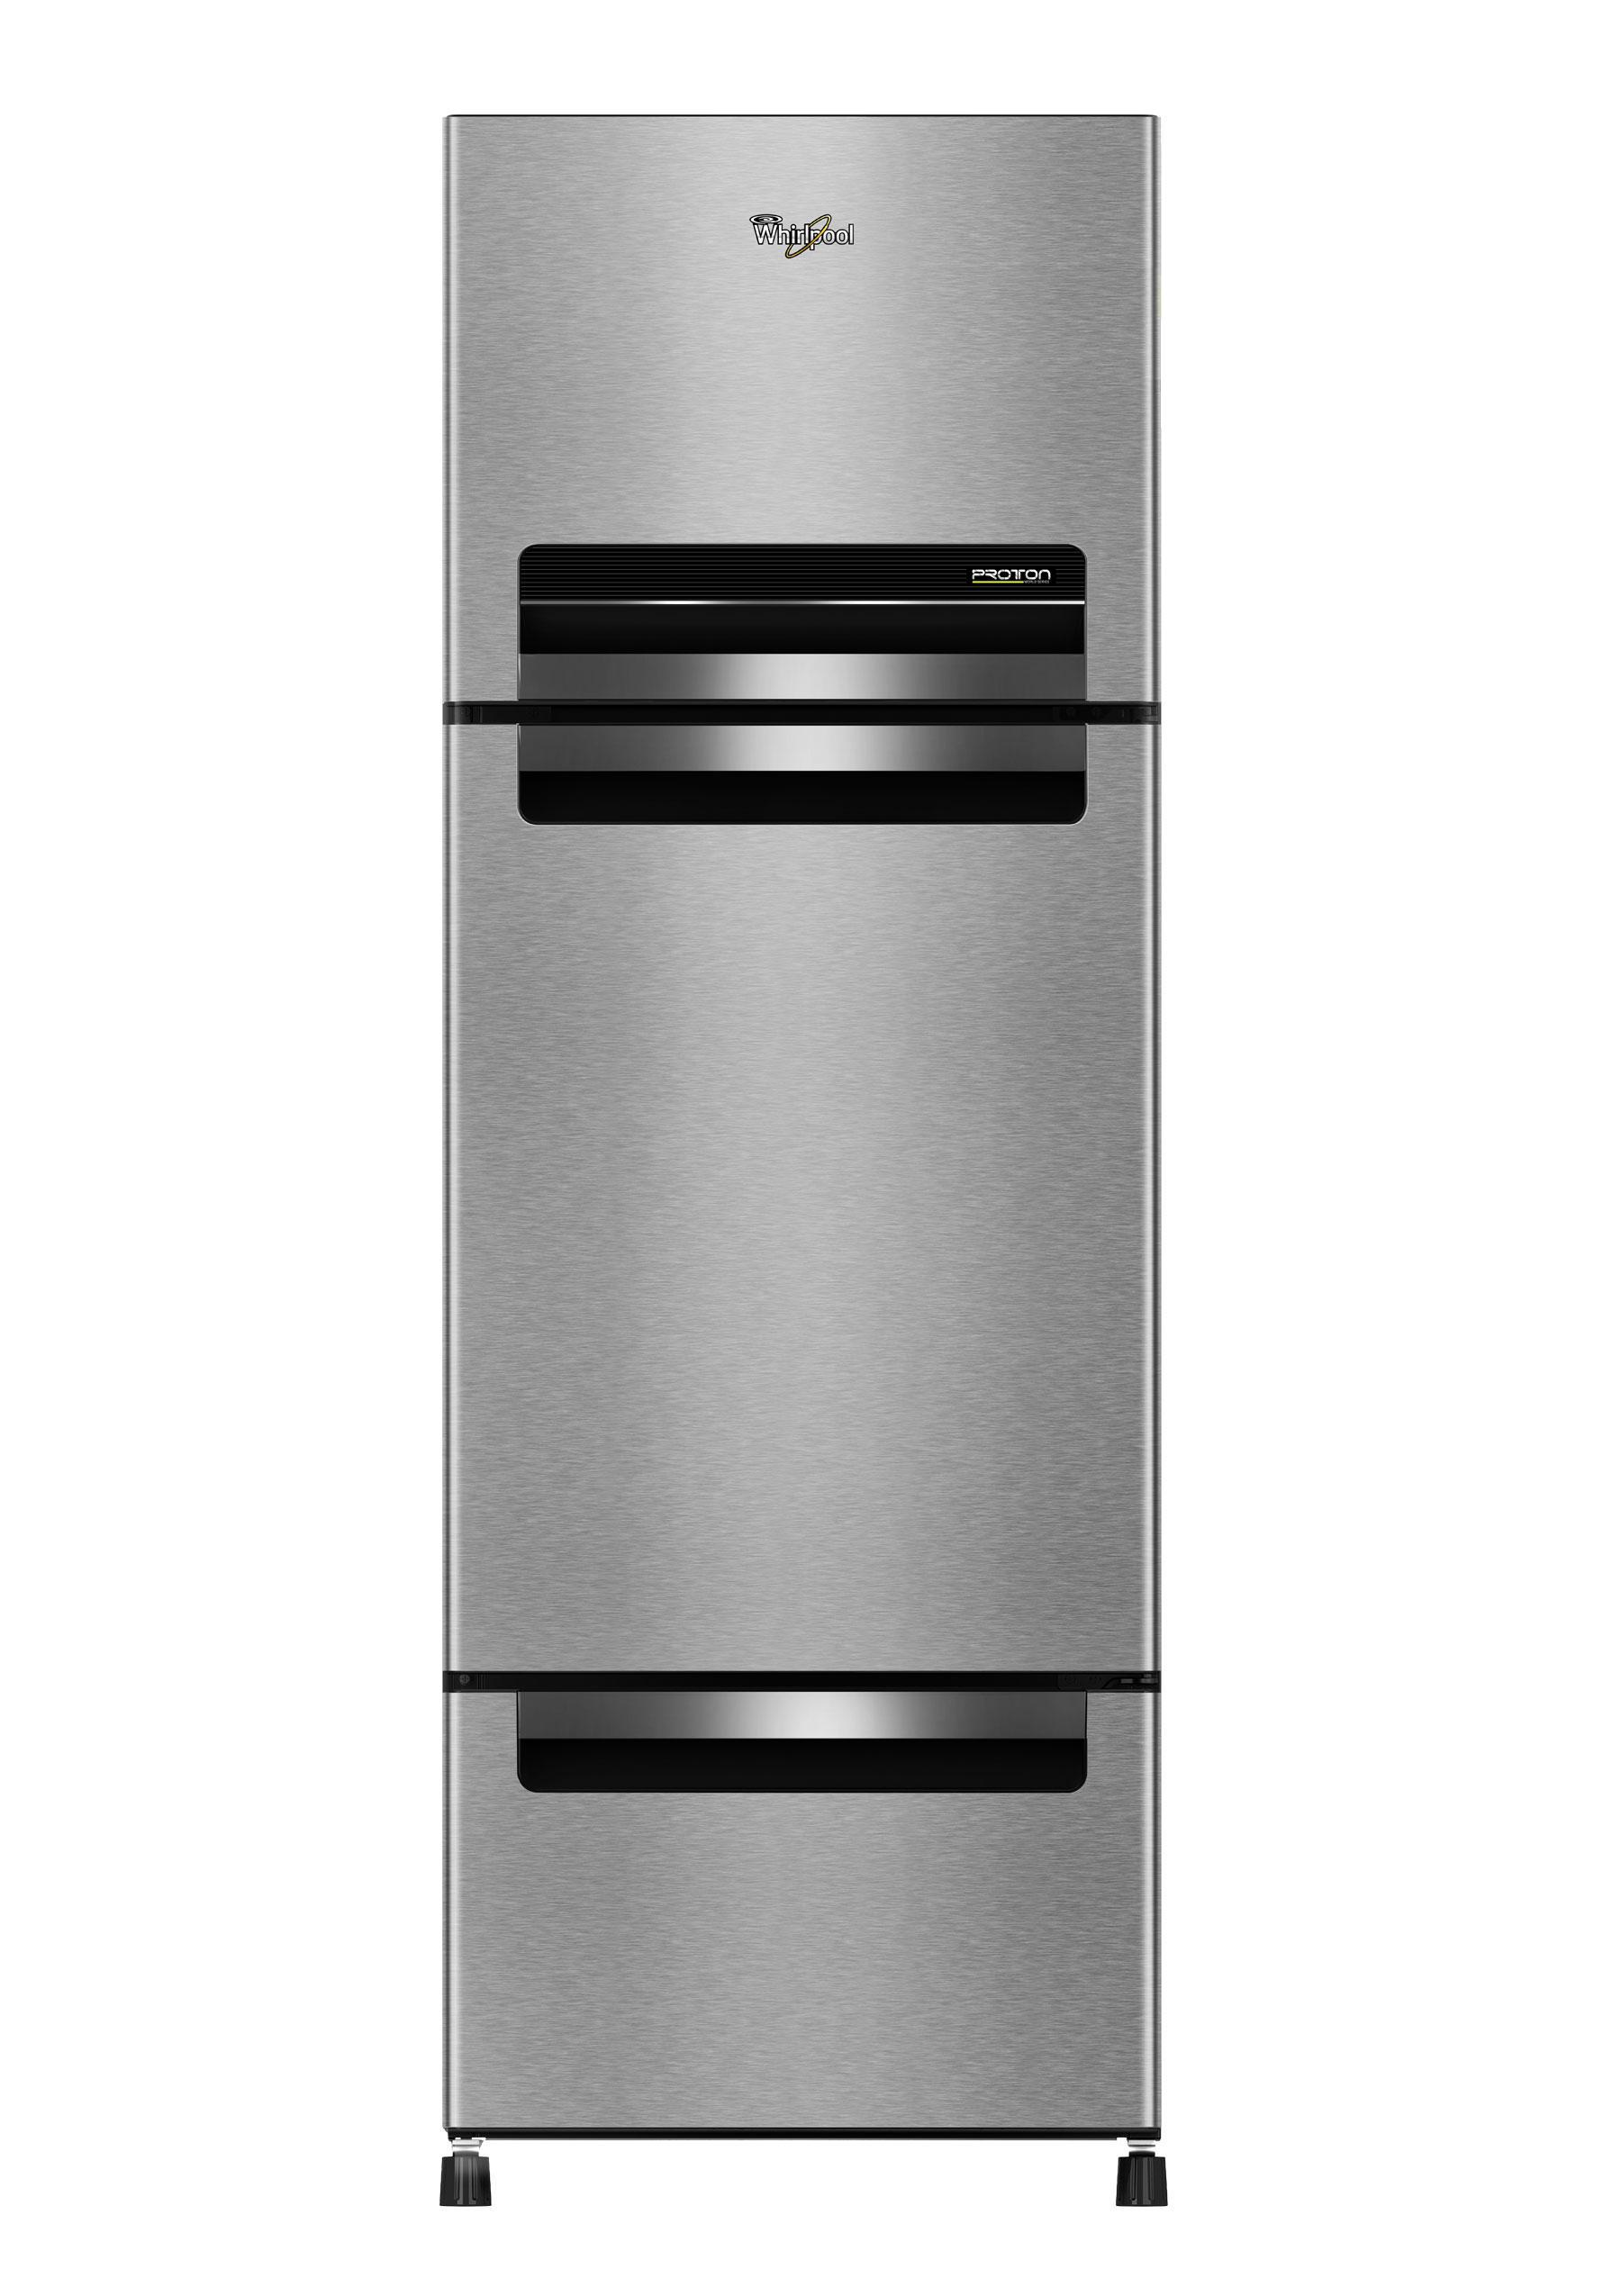 Whirlpool Three Door Refrigerator FP 283D Protton Royal Image